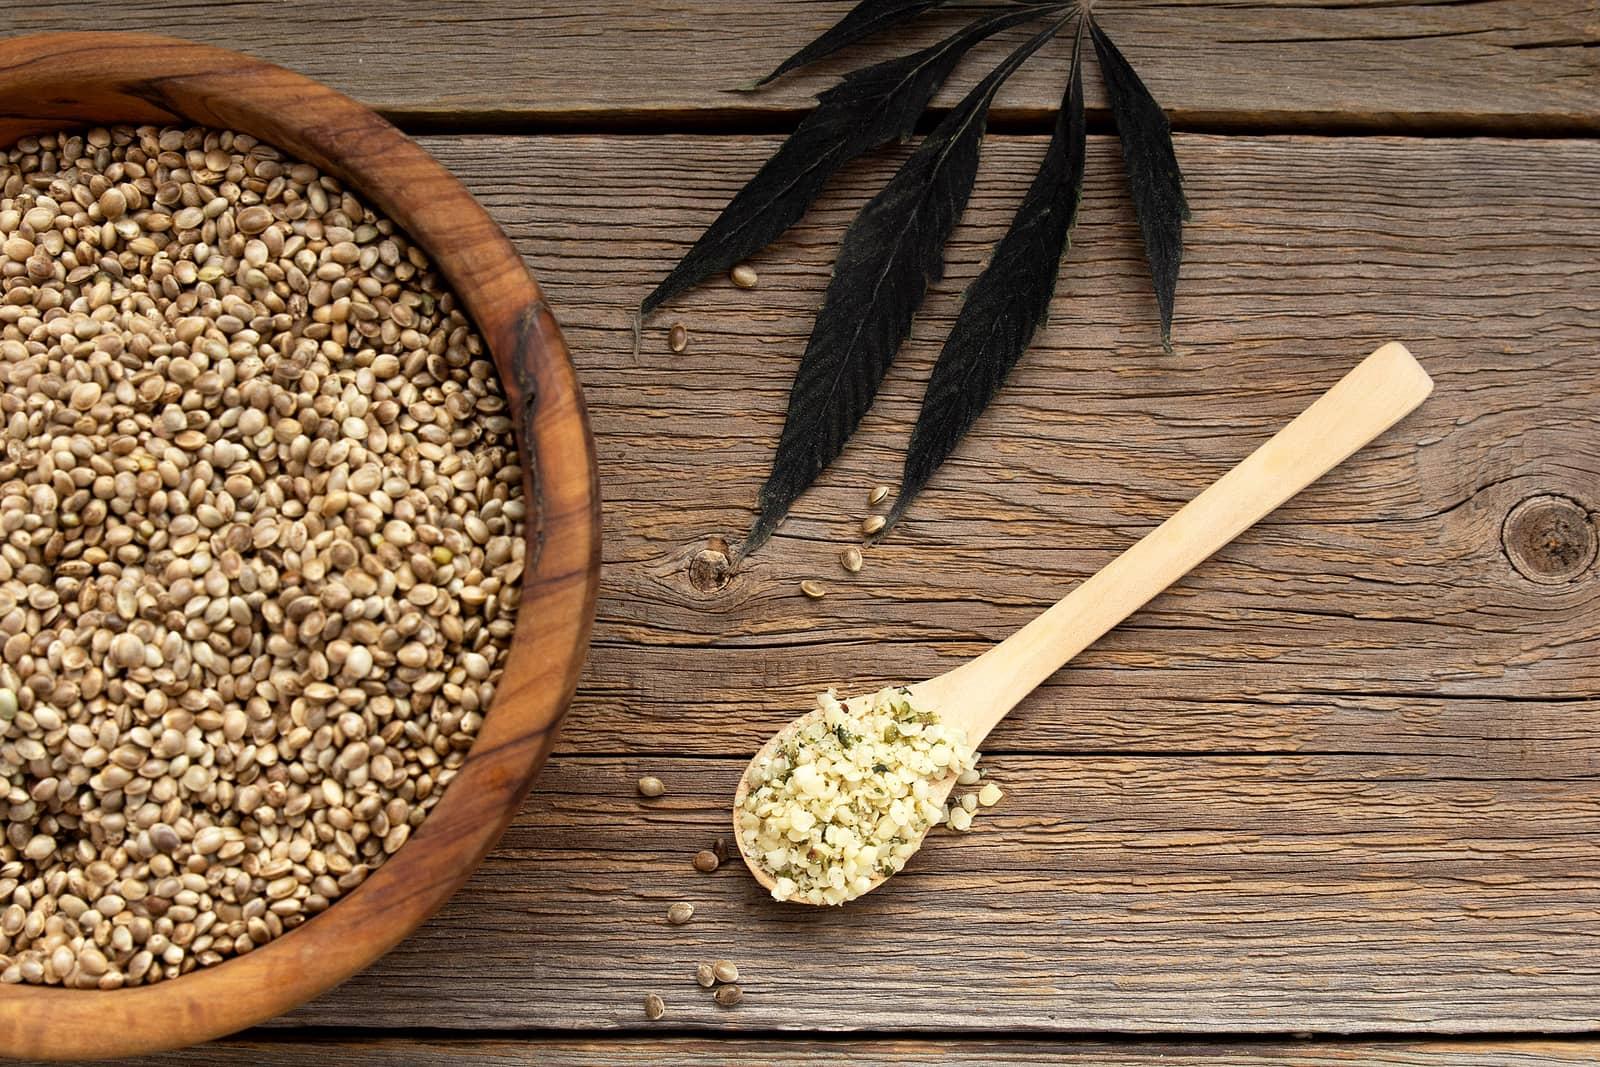 Purchasing Marijuana Seeds in South Carolina